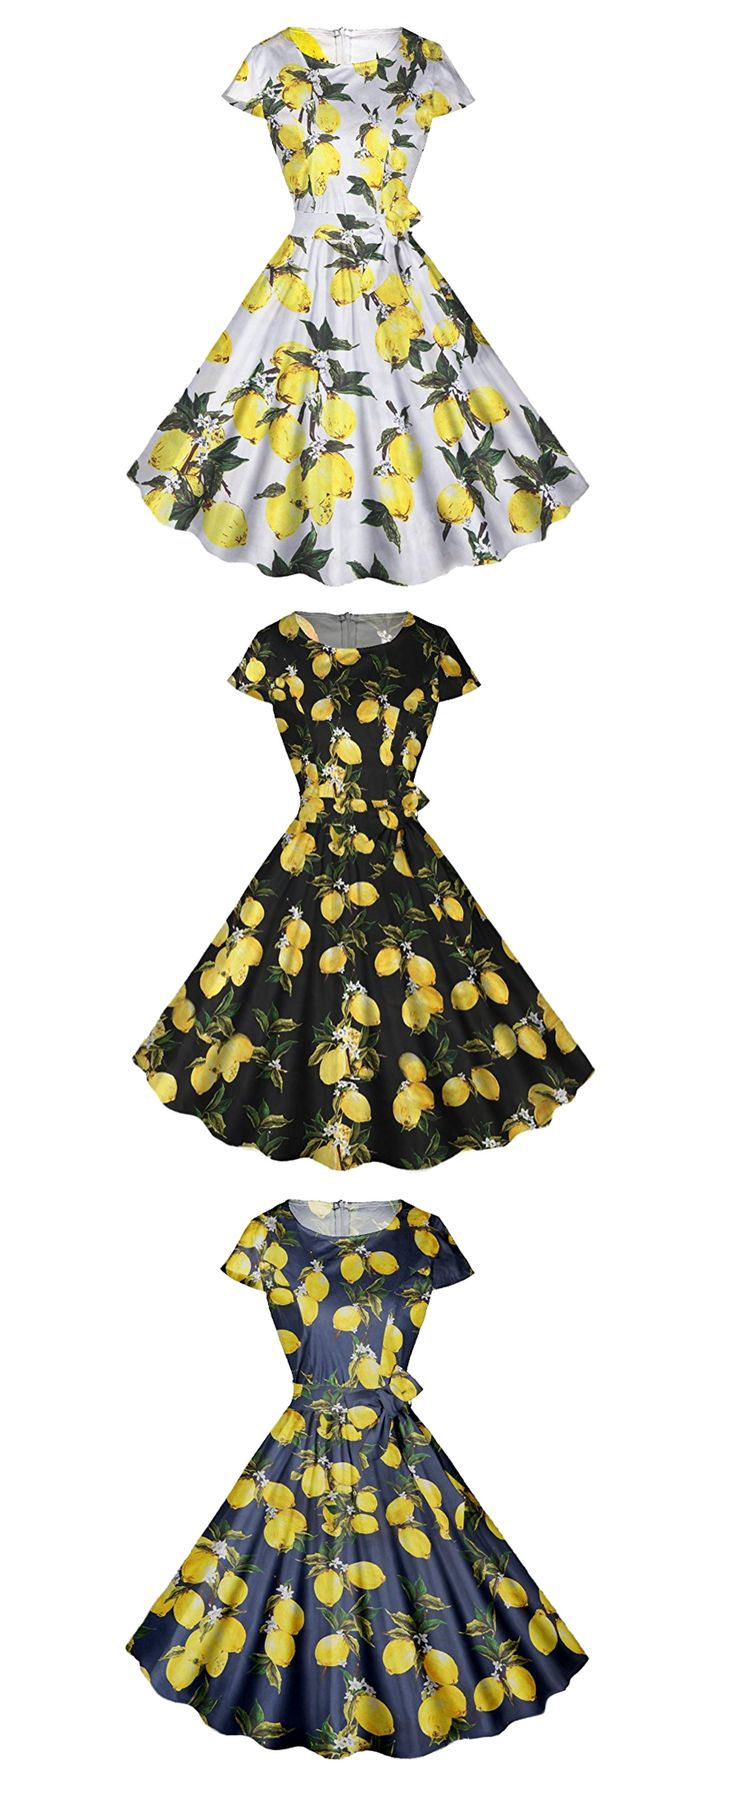 Cute bridesmaids dresses with lemon design, fifties retro style bridesmaids dresses, elegant bridesmaids dresses, classes tea dresses for bridesmaids -  FitDesign Vintage Reto Swing Formal Dresses Polka Dots Skull Cocktail Party Cap Sleeves -  https://www.amazon.com/FitDesign-Vintage-Dresses-Cocktail-Sleeves/dp/B072PHQBZ6/ref=as_li_ss_tl?s=apparel&ie=UTF8&qid=1506108122&sr=1-91&nodeID=11006703011&psd=1&linkCode=ll1&tag=theweddingclu-20&linkId=e54a532306664714b4bf662a3df5e83e